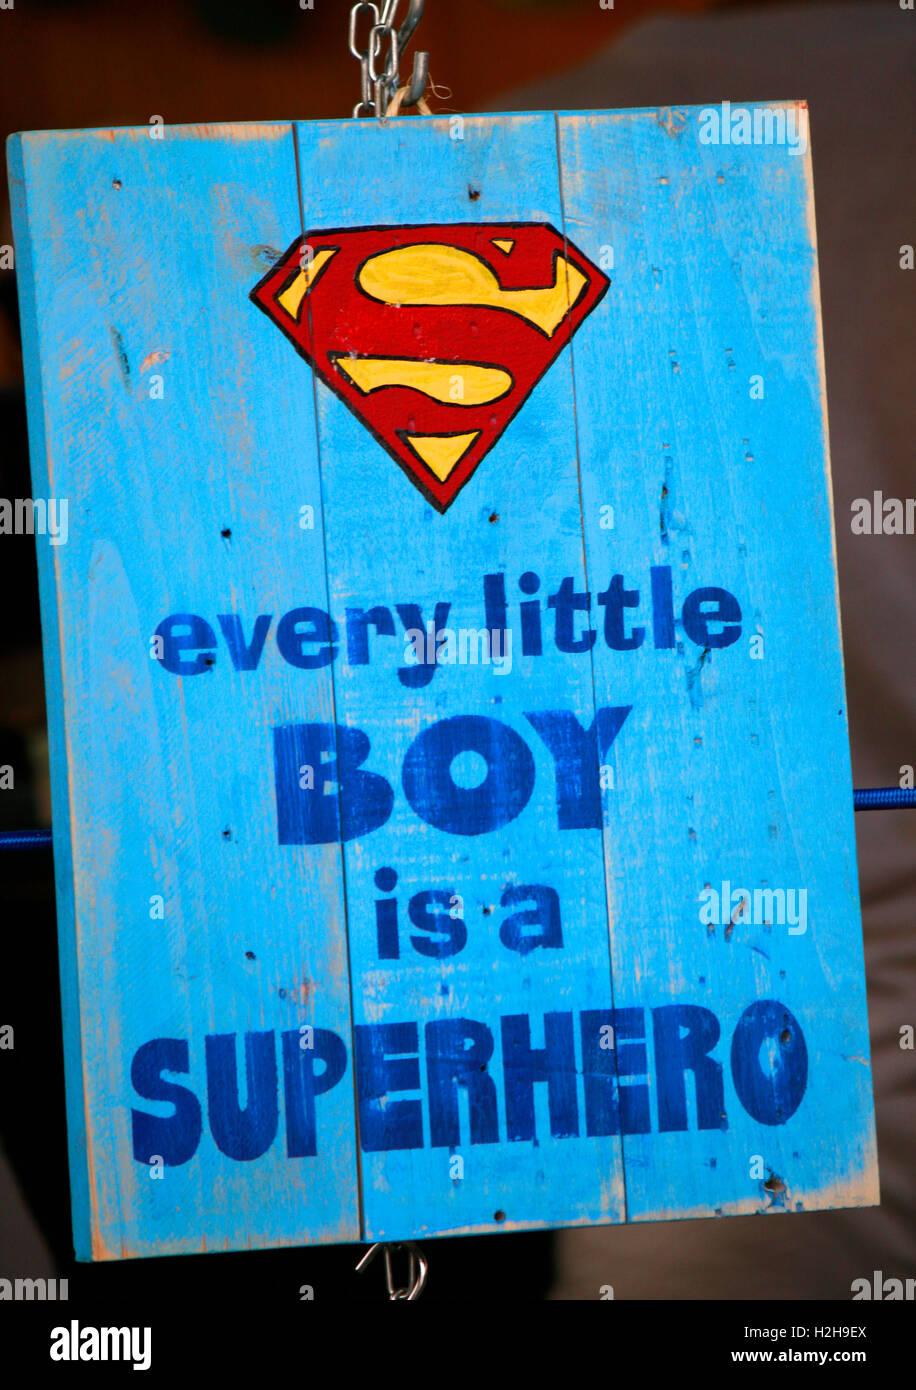 Slogan mit Superman Logo 'Every little boy is a superhero', Ibiza, Spanien. - Stock Image